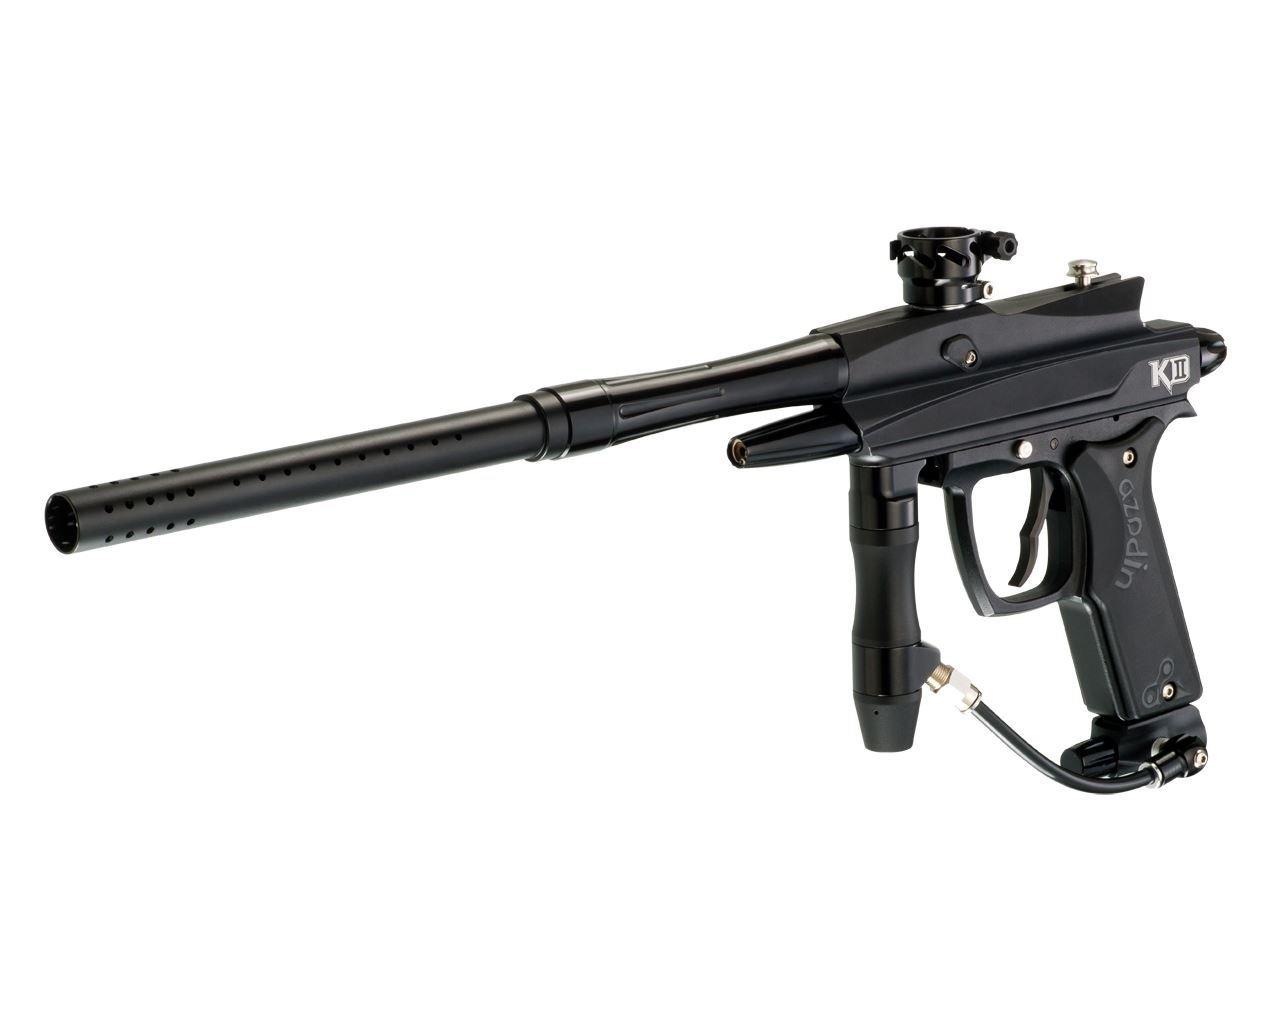 Amazoncom Azodin KD II Paintball Gun Ninja Sports Outdoors 1280x1024